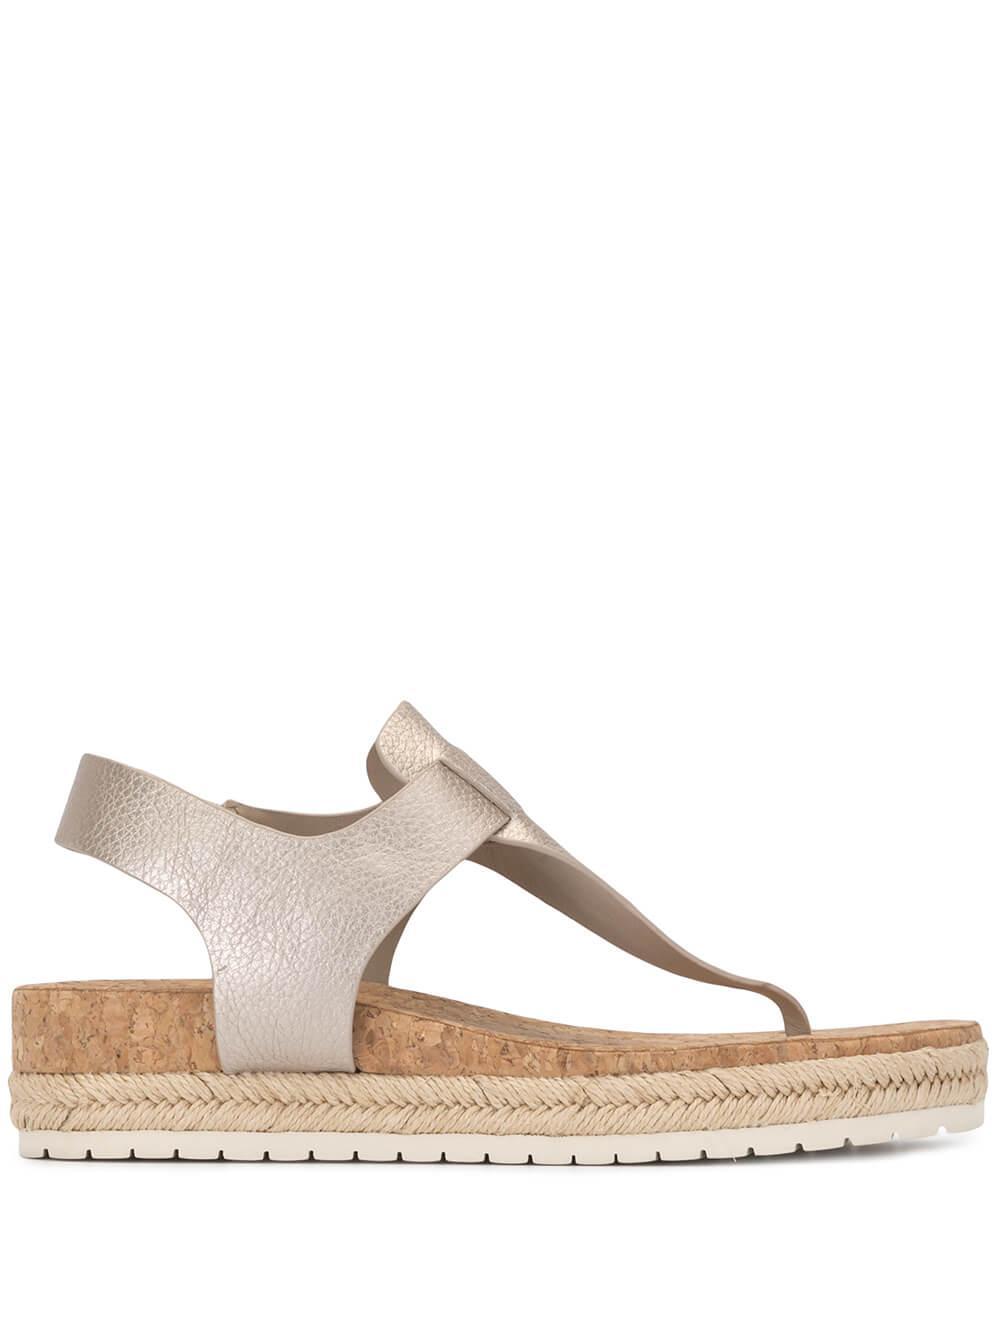 Cork T- Strap Sandal Item # FLINT-2